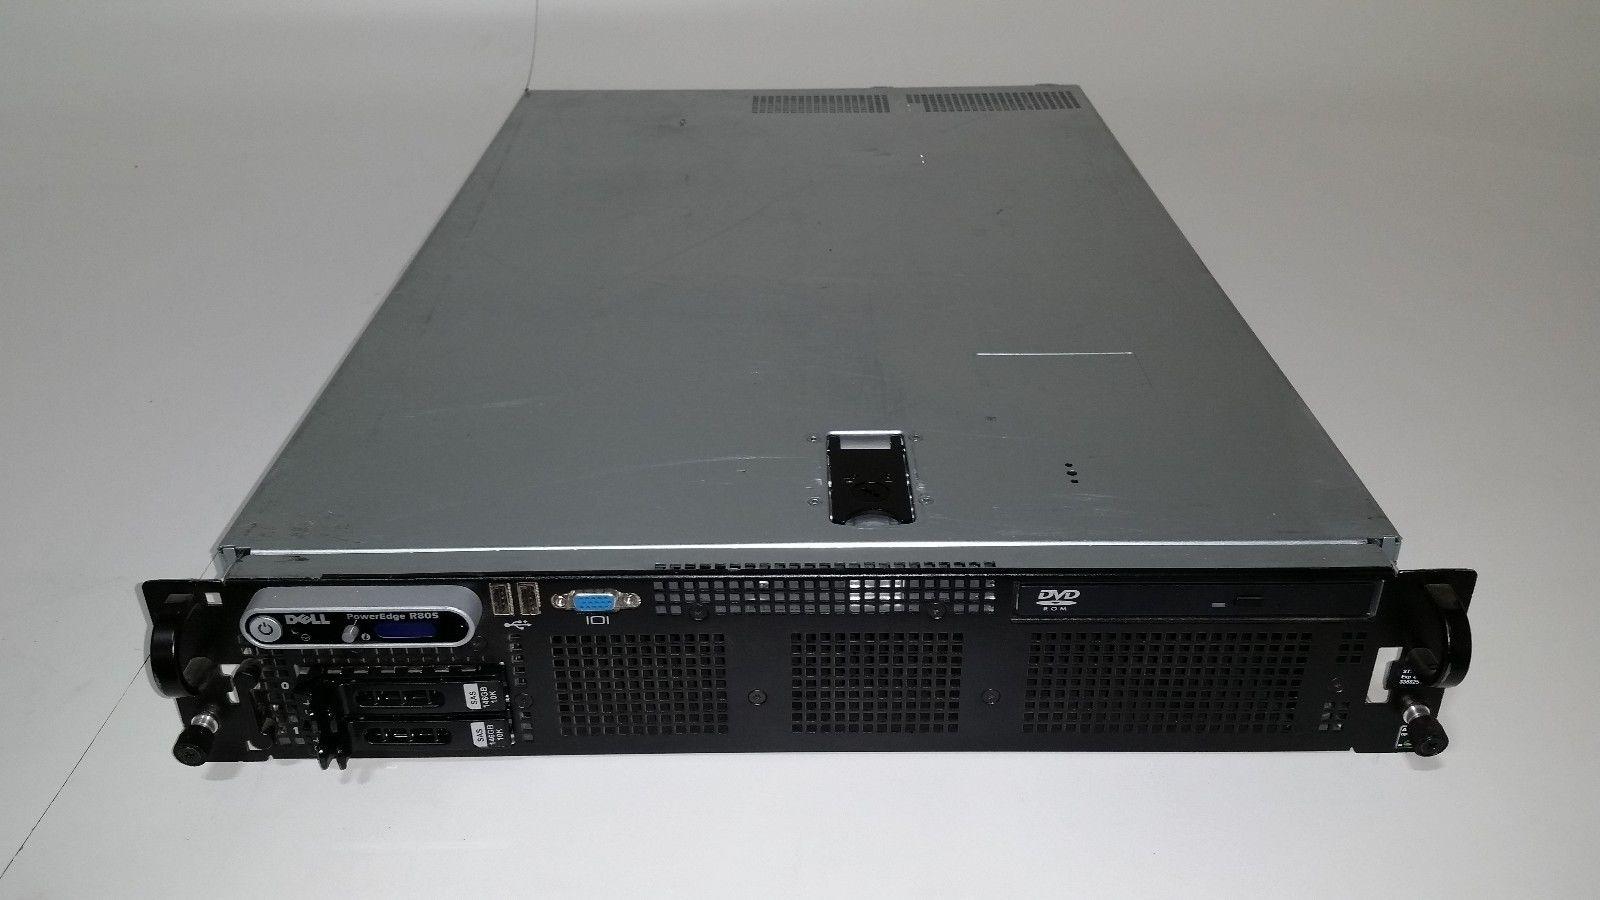 Dell Poweredge R805 2x Amd Opteron 23ghz Quad Core 16gb Ram Server 146gb 10k Garland Computers